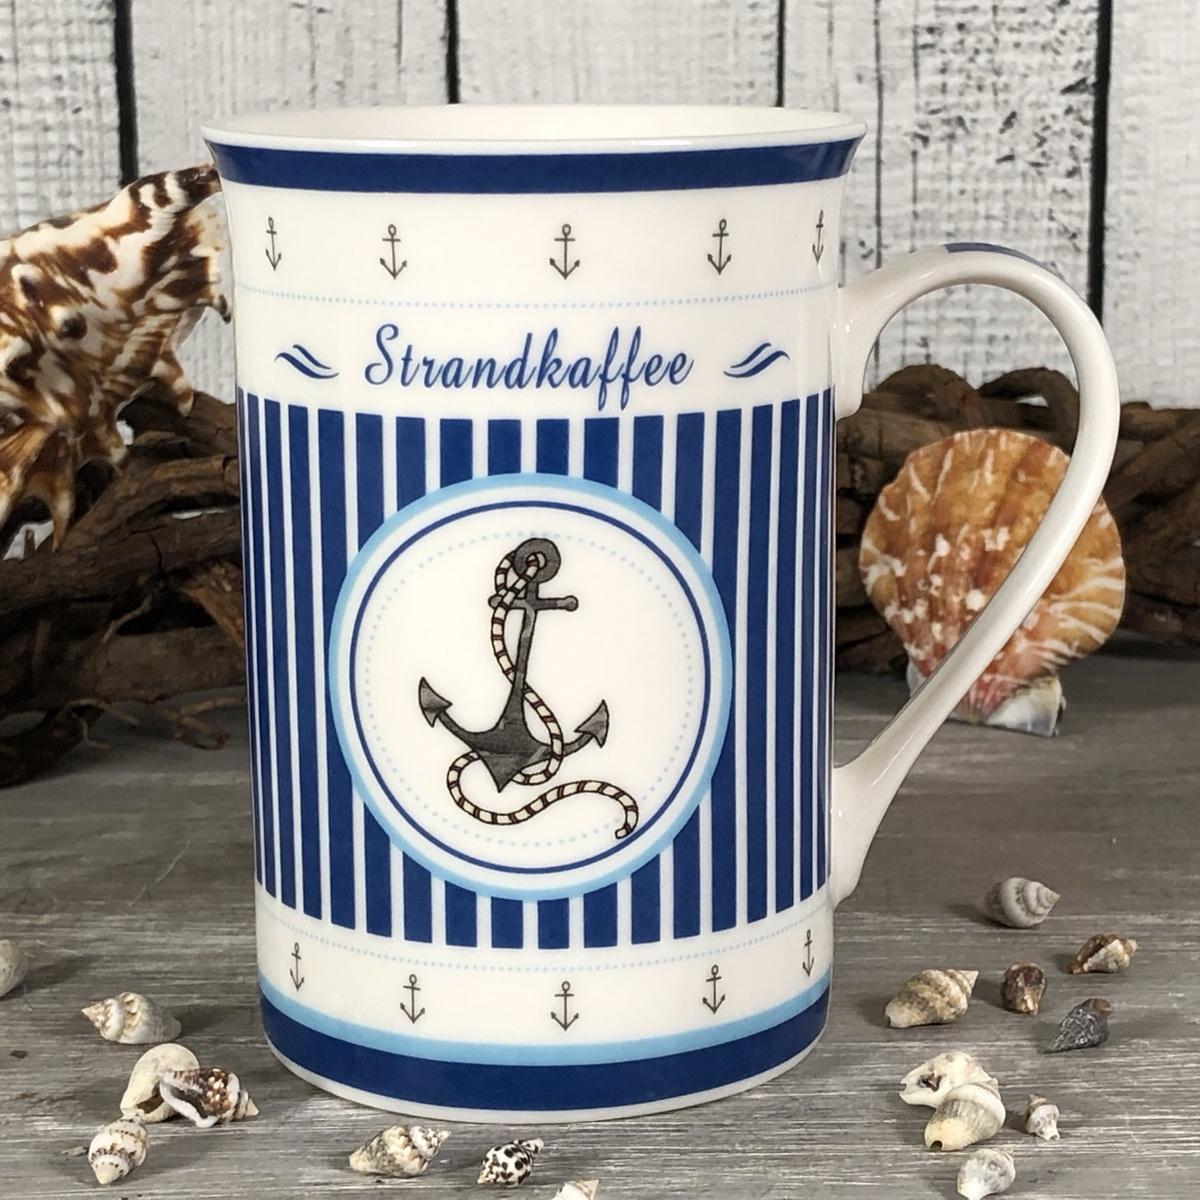 Kaffeebecher Porzellan ANKER Strandkaffee blau weiß Becher Tasse maritim